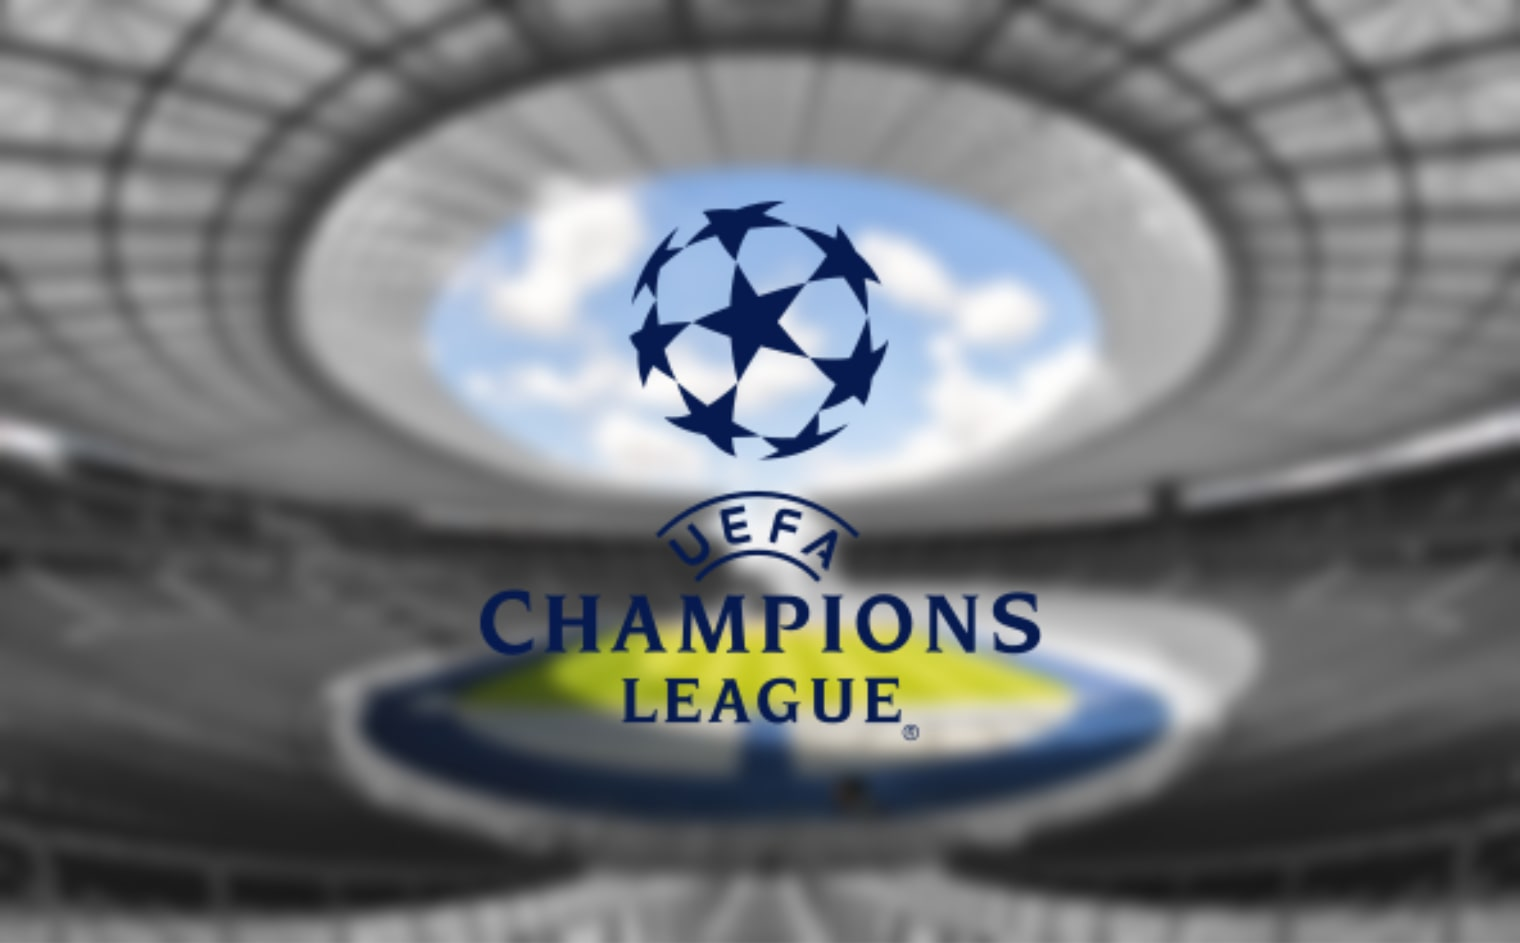 Champions League 2019 Play-Off First Leg 21.08 Match Day Recap